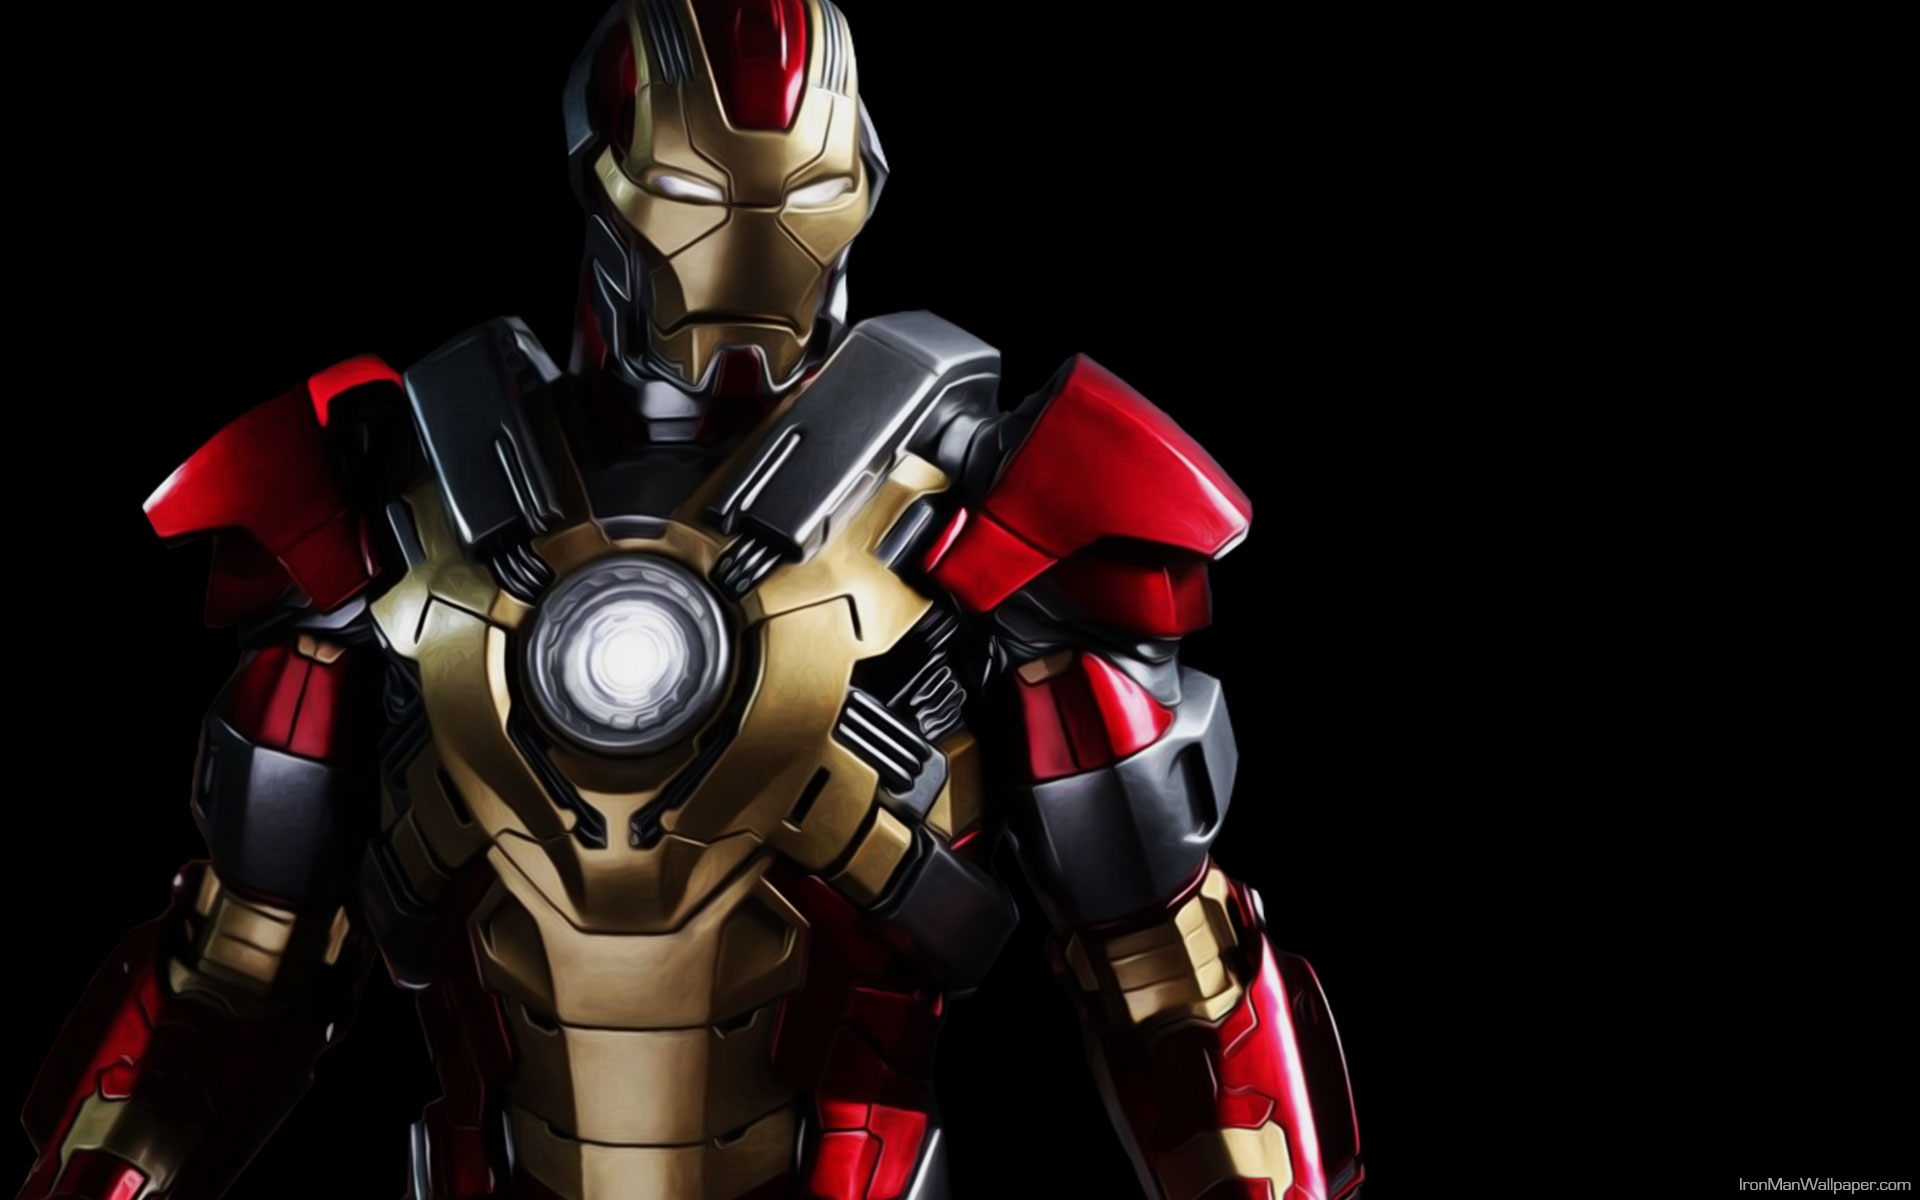 52 Gambar Iron Man Terkeren Gratis Terbaru